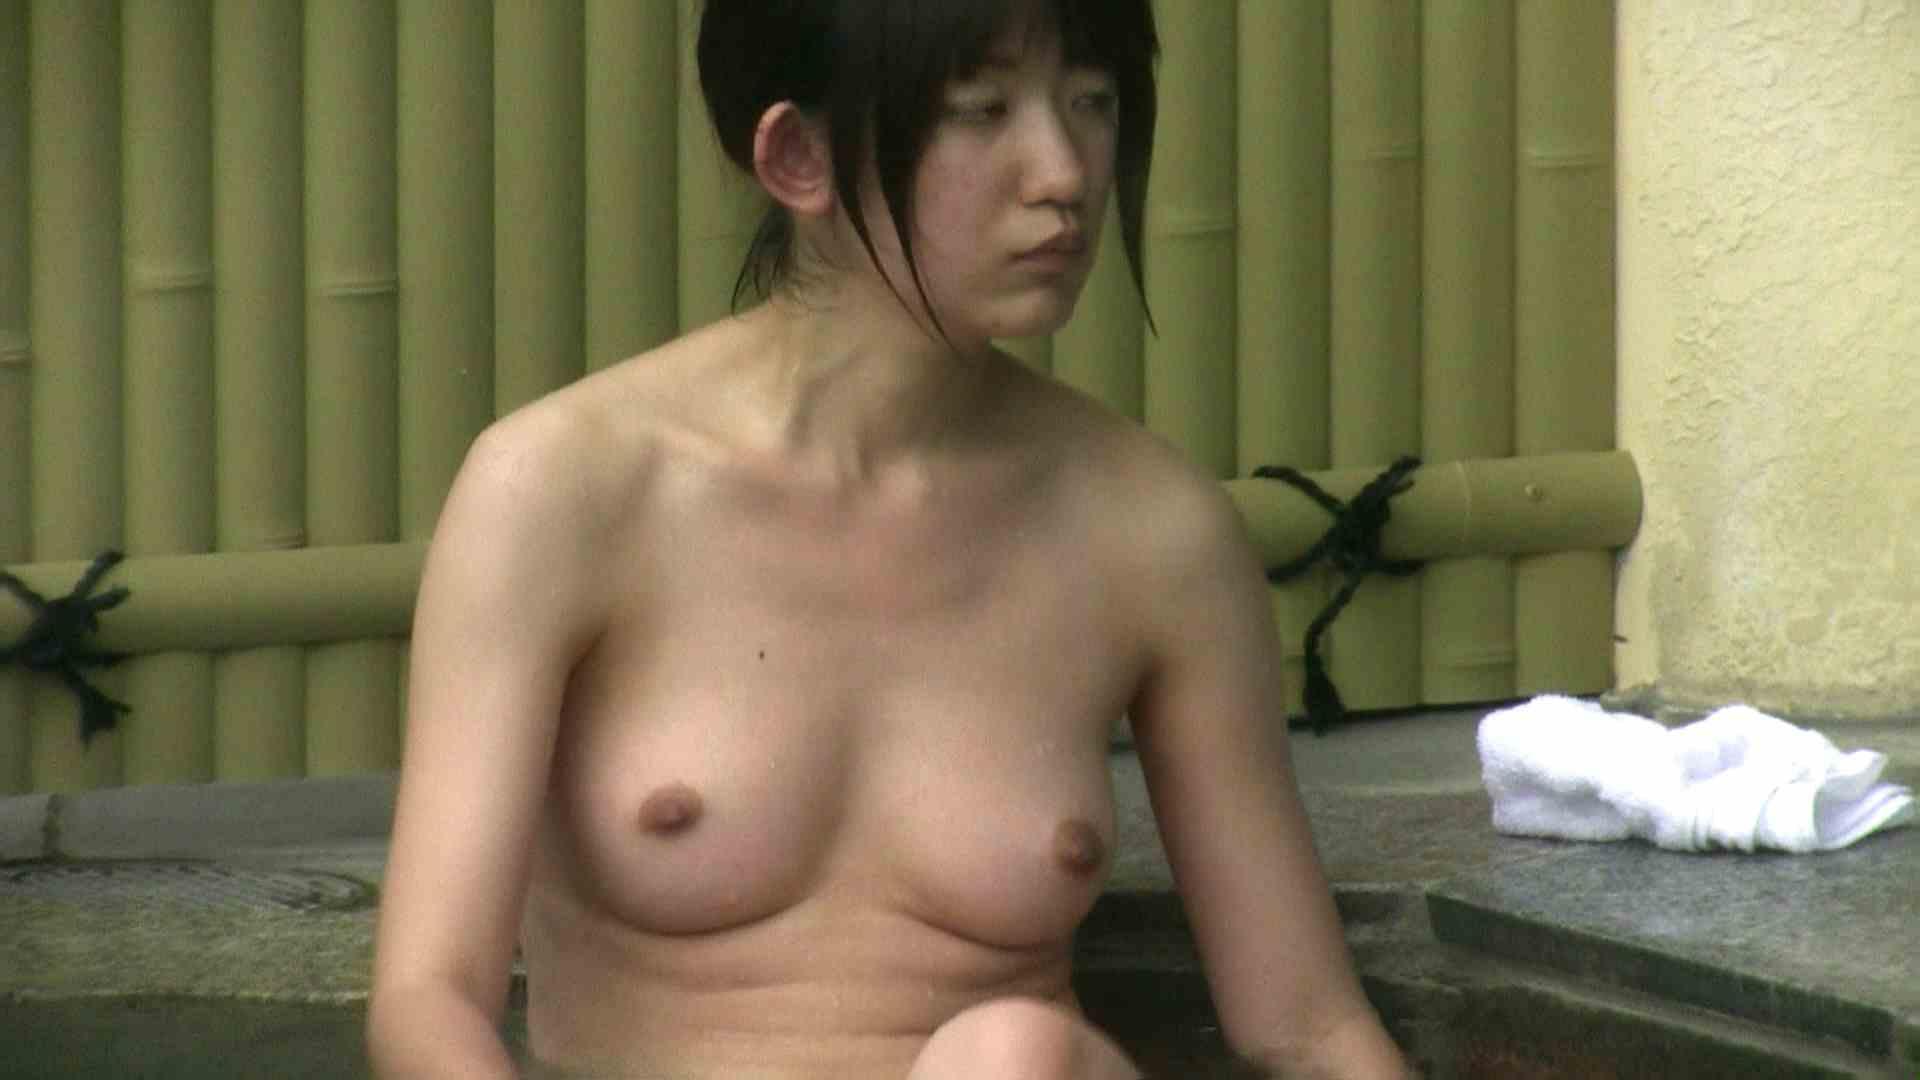 Aquaな露天風呂Vol.34【VIP】 盗撮シリーズ | 露天風呂編  99PIX 59